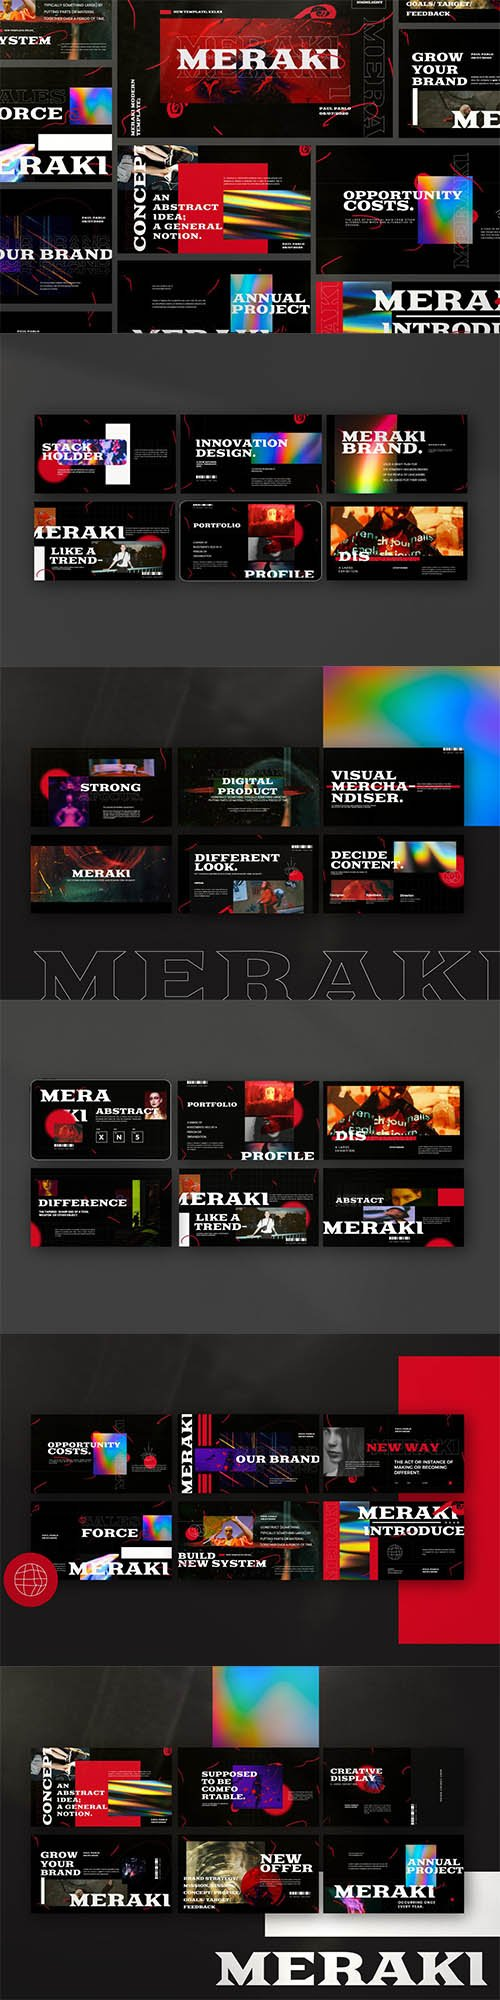 Meraki - Urban Creative Agency Powerpoint, Keynote and Google Slides